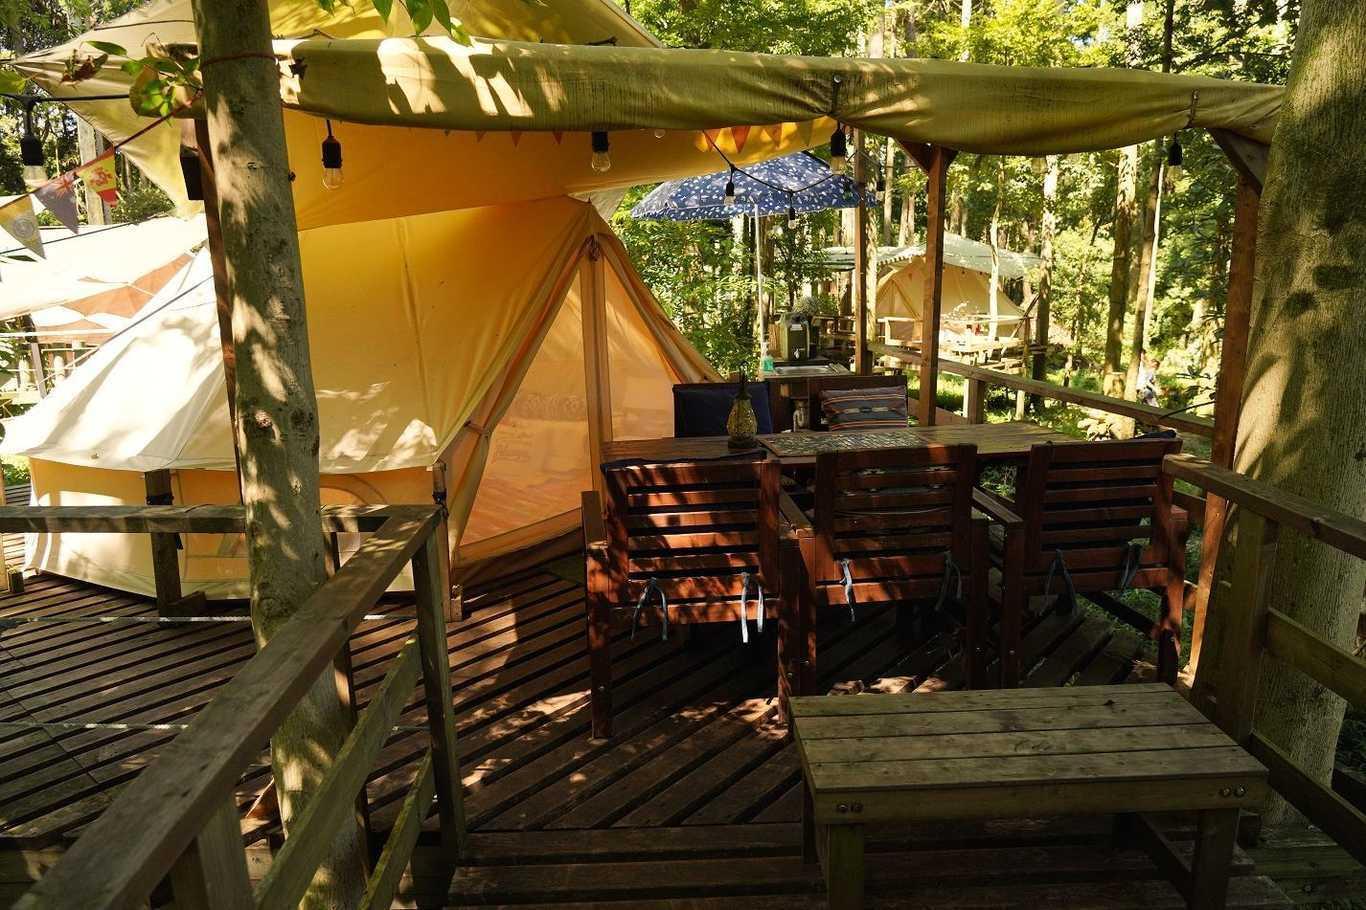 Camping GREEN(キャンピンググリーン) の公式写真c14251